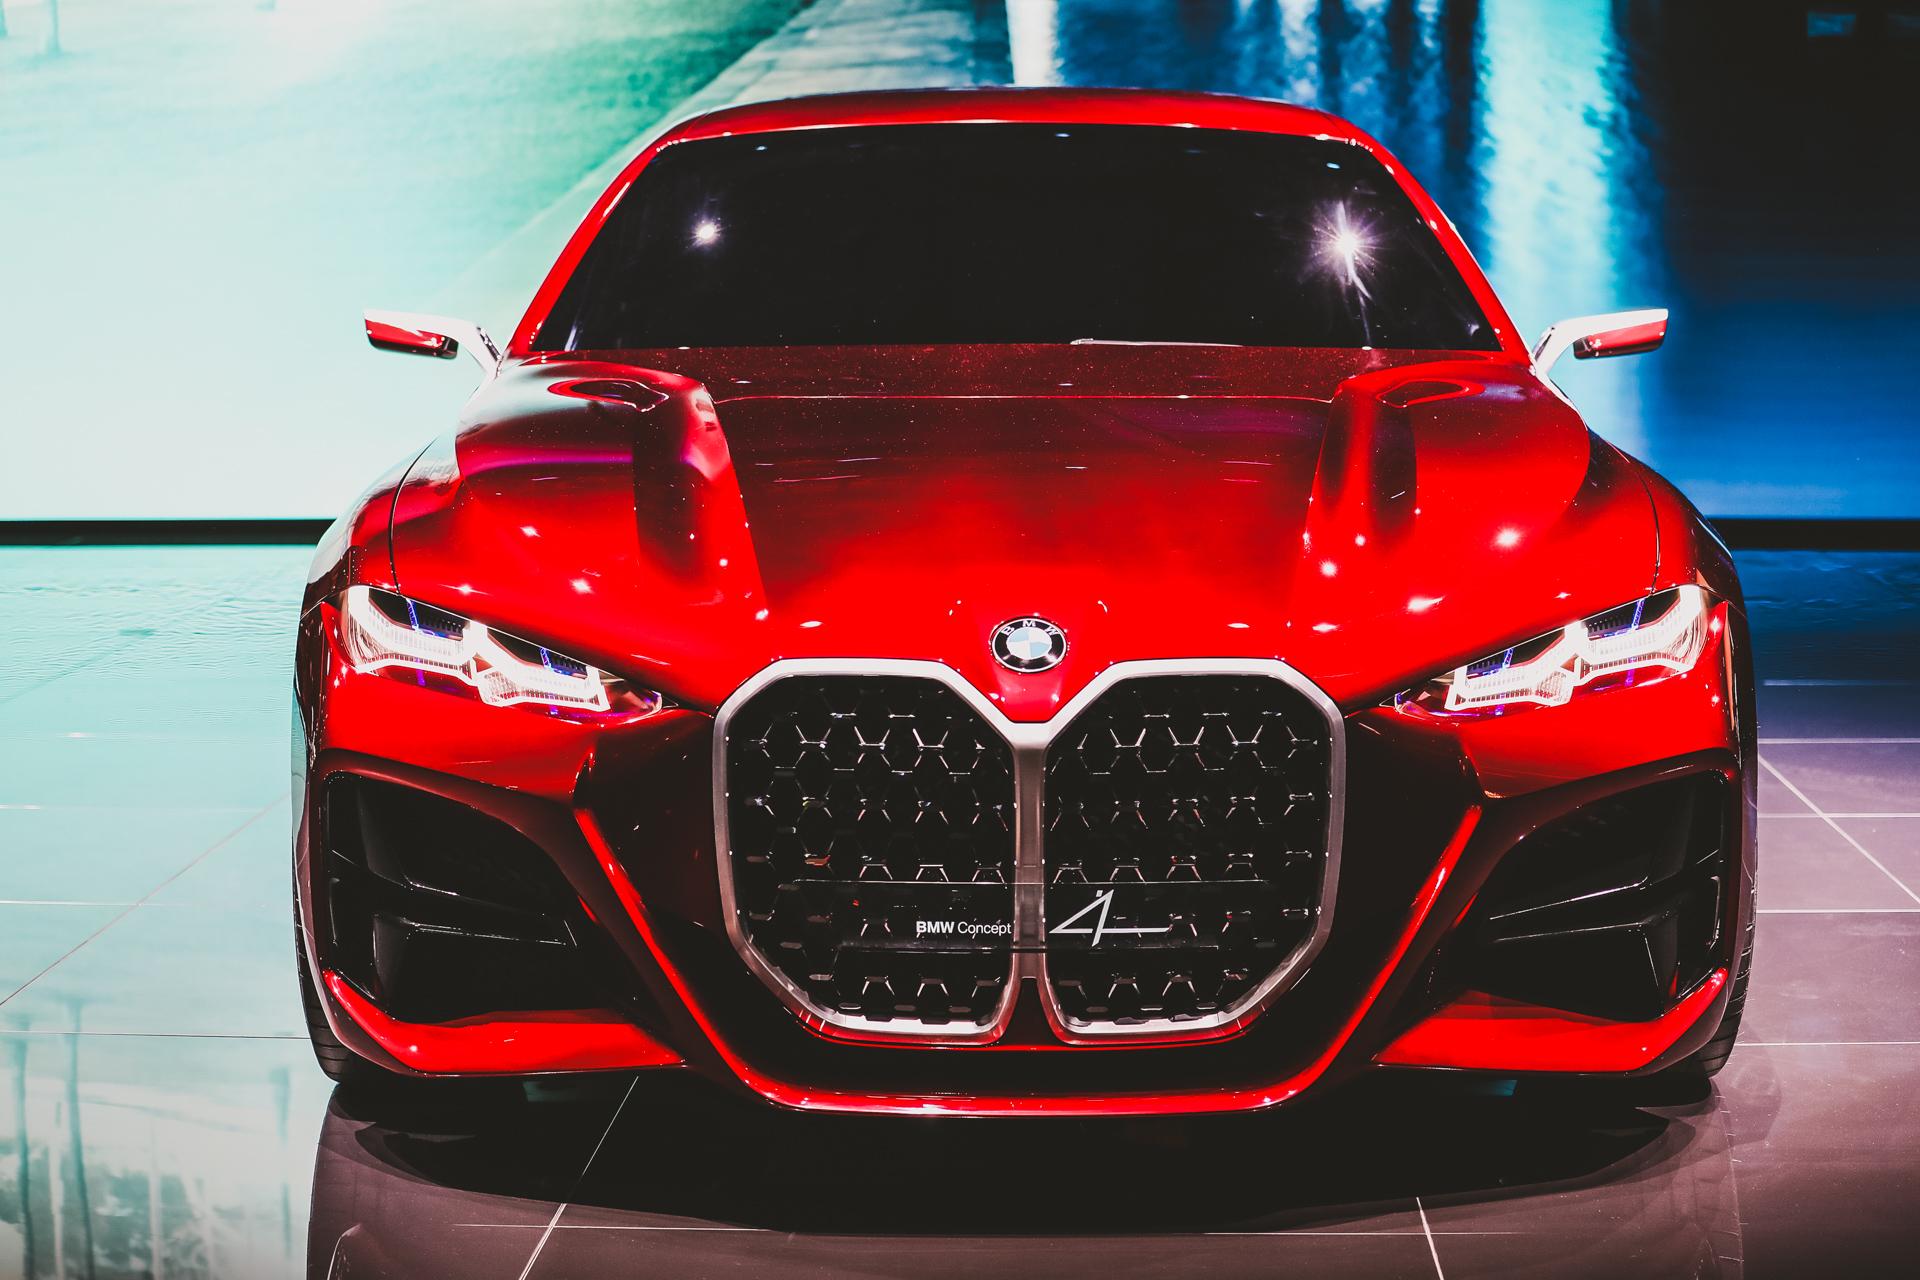 Domagoj Dukec, Head of BMW Design, talks about the BMW Concept 4 Series